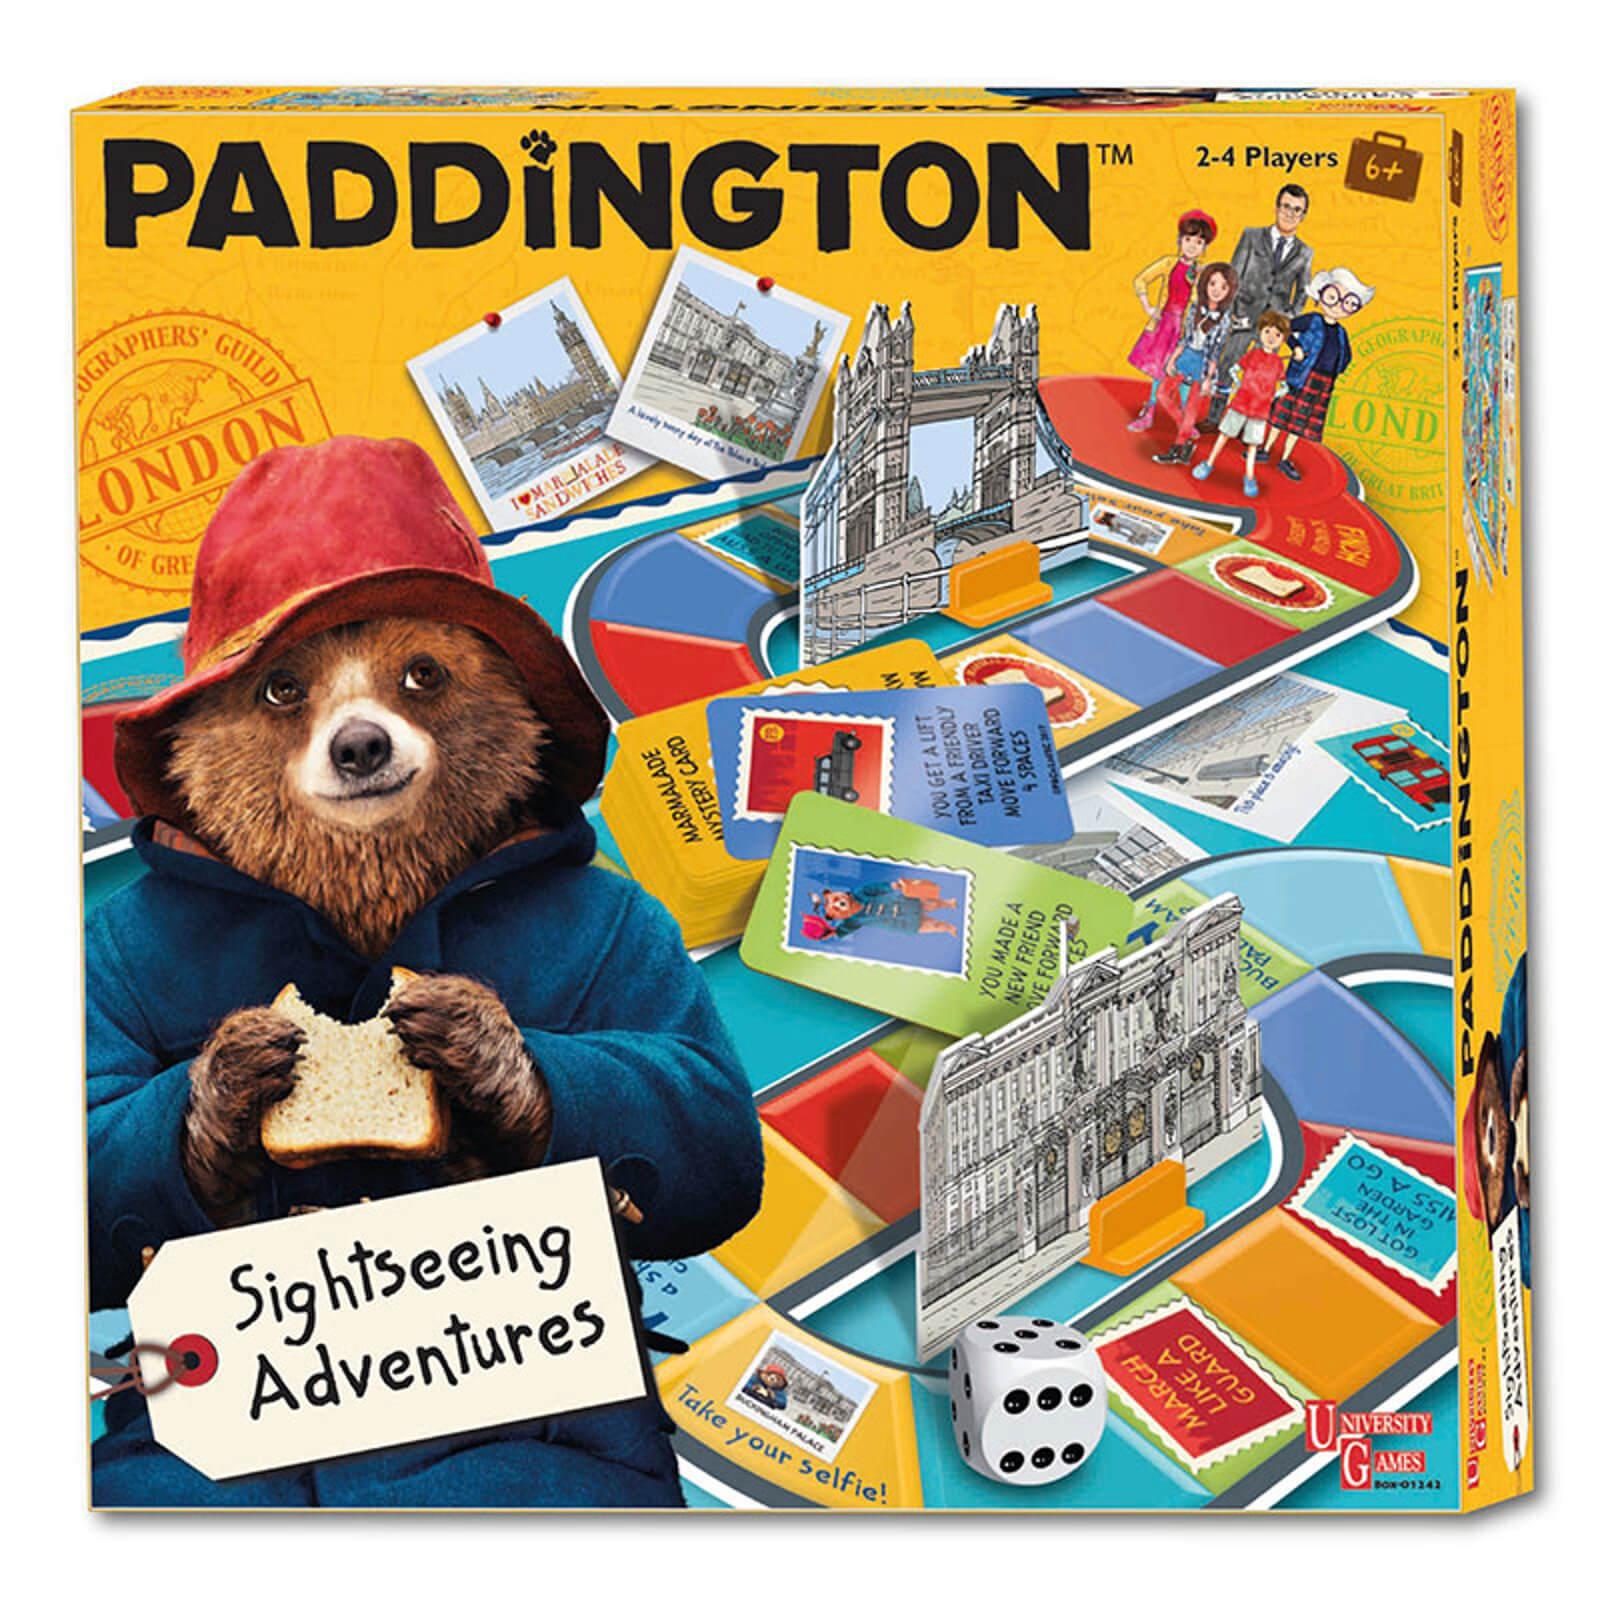 University Games Paddington Board Game